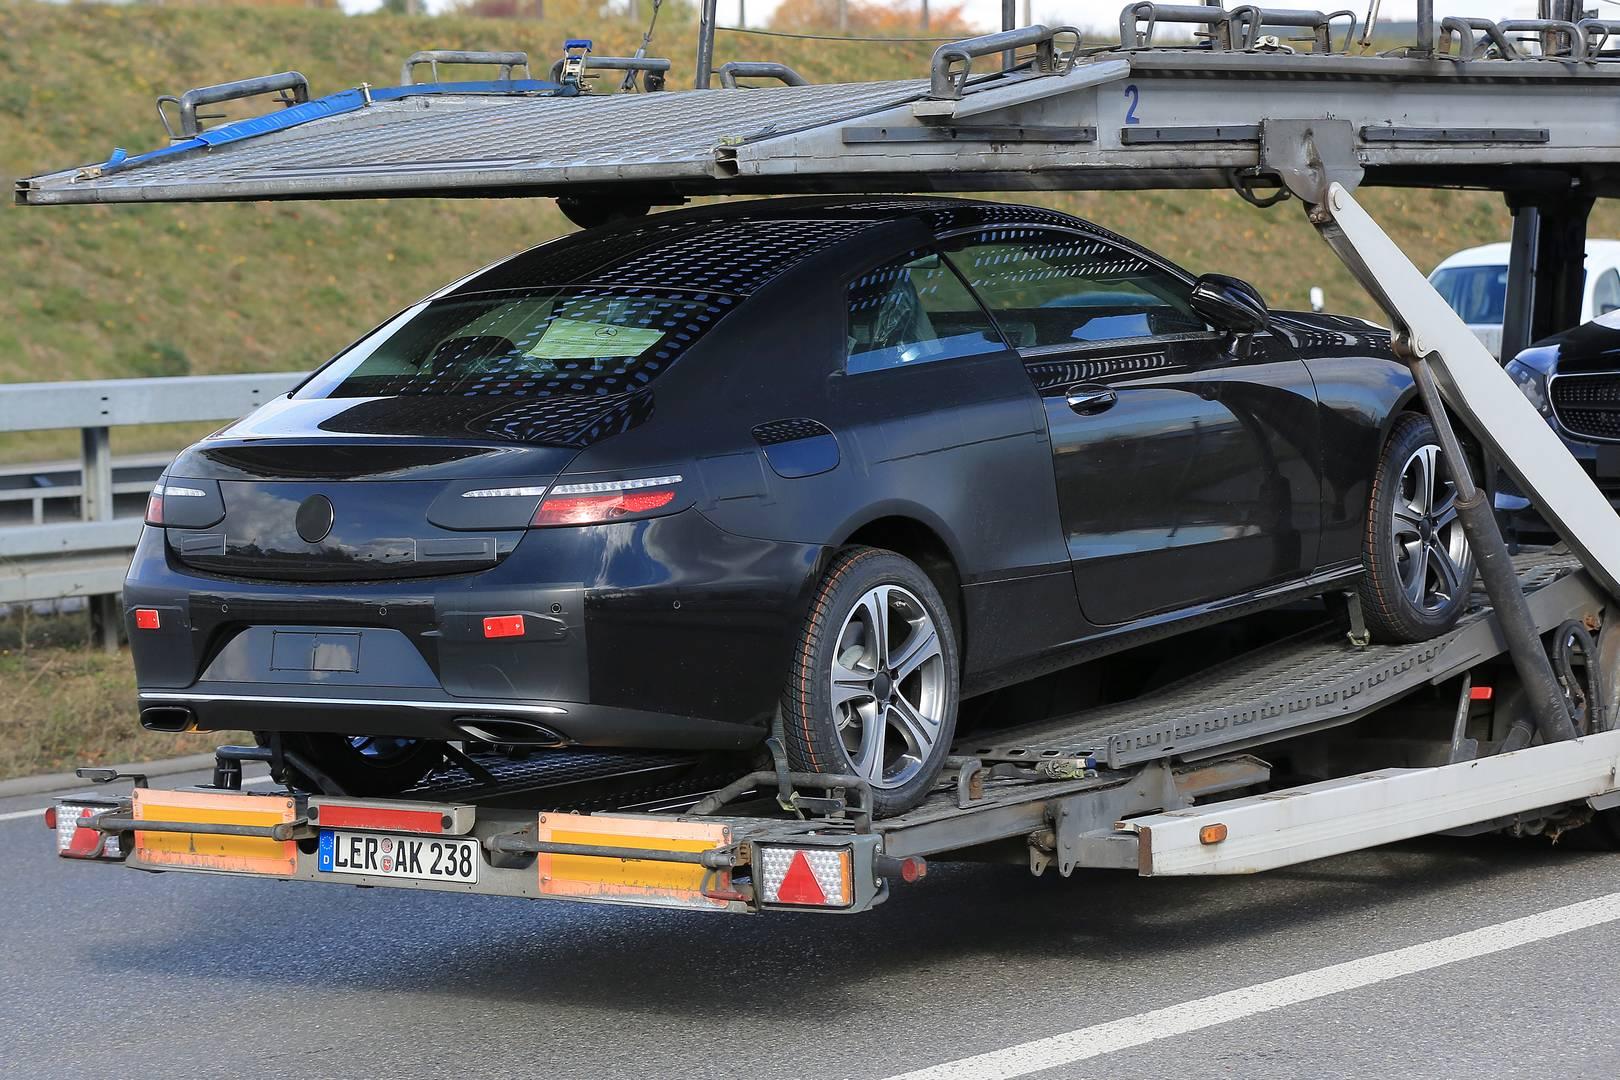 Spy Shots Reveal the 2018 MercedesBenz EClass Coupe